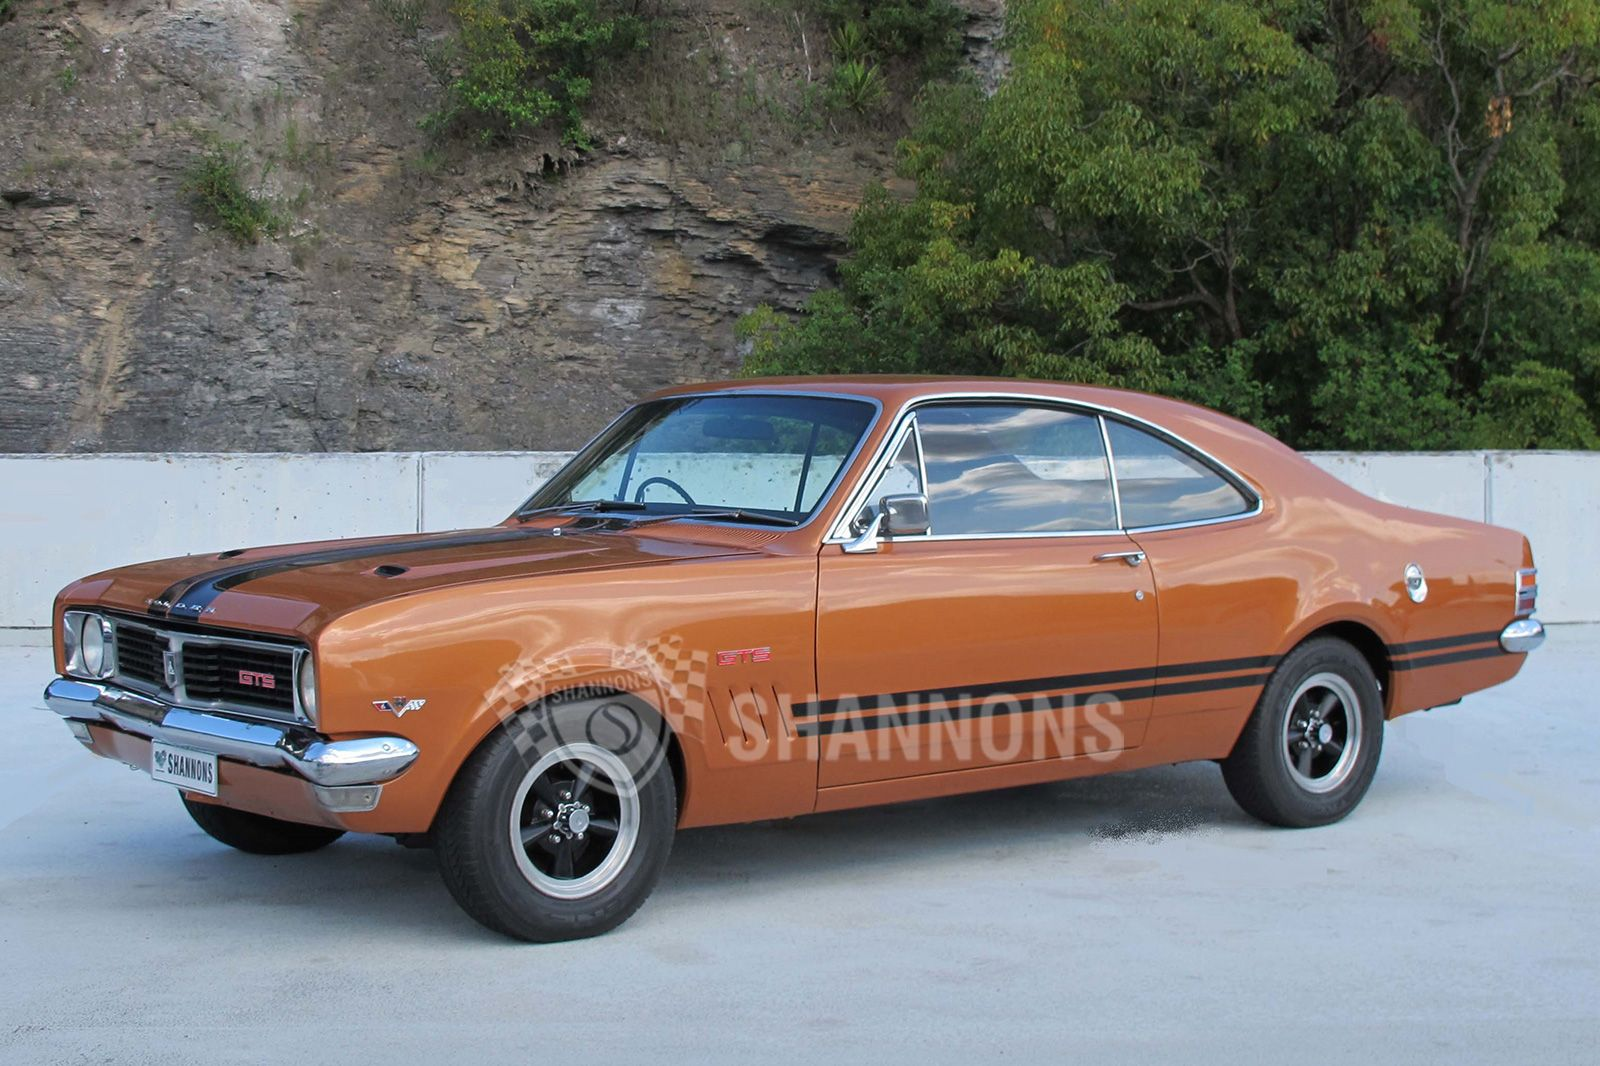 1969 Holden HT Monaro GTS 350 'Bathurst' Coupe